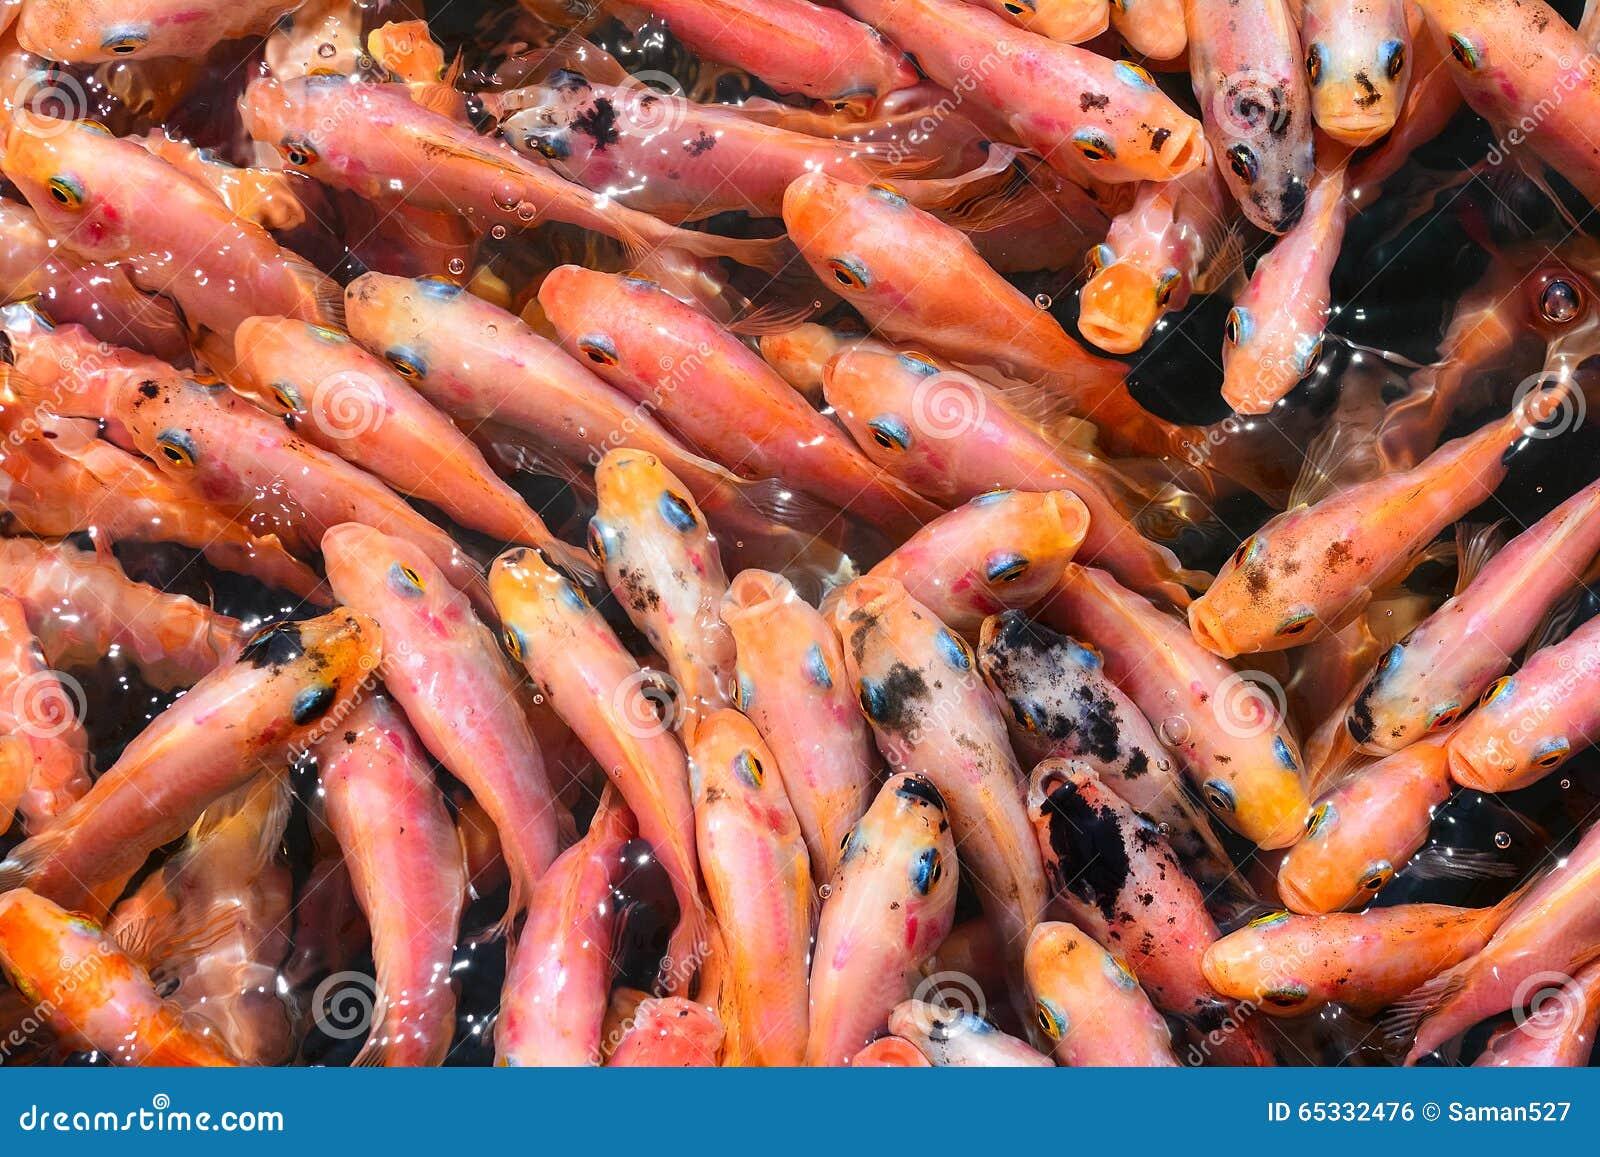 Aquarium fish tank sri lanka - Fish Spa Therapy At Madu River In Sri Lanka Royalty Free Stock Image